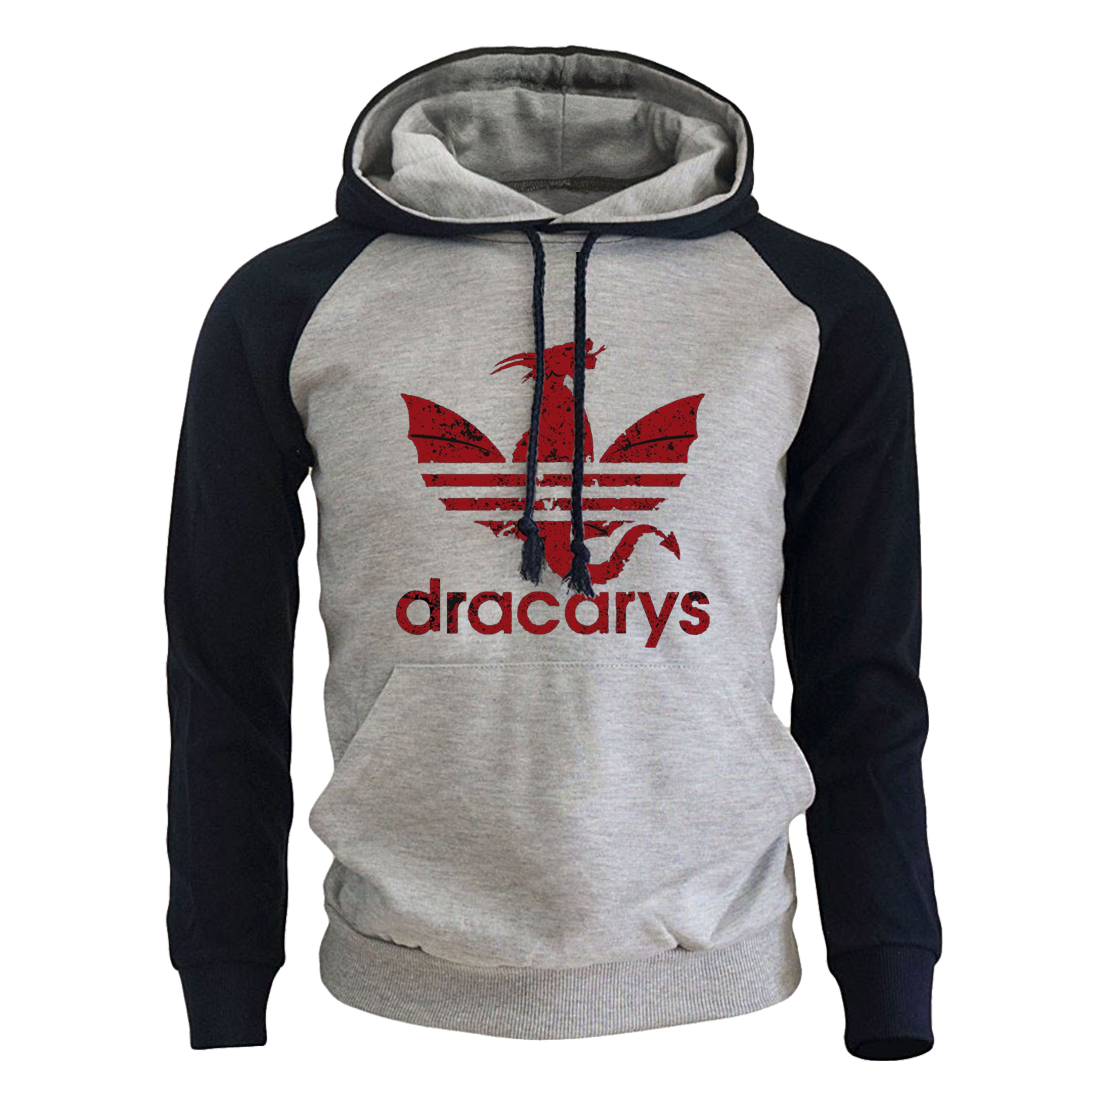 Dracarys Dragon Print Mens Game Of Thrones Hoodie Fleece Fashion Brand Sweatshirt Male Hot Sale Pullover Harajuku Streetwear Top